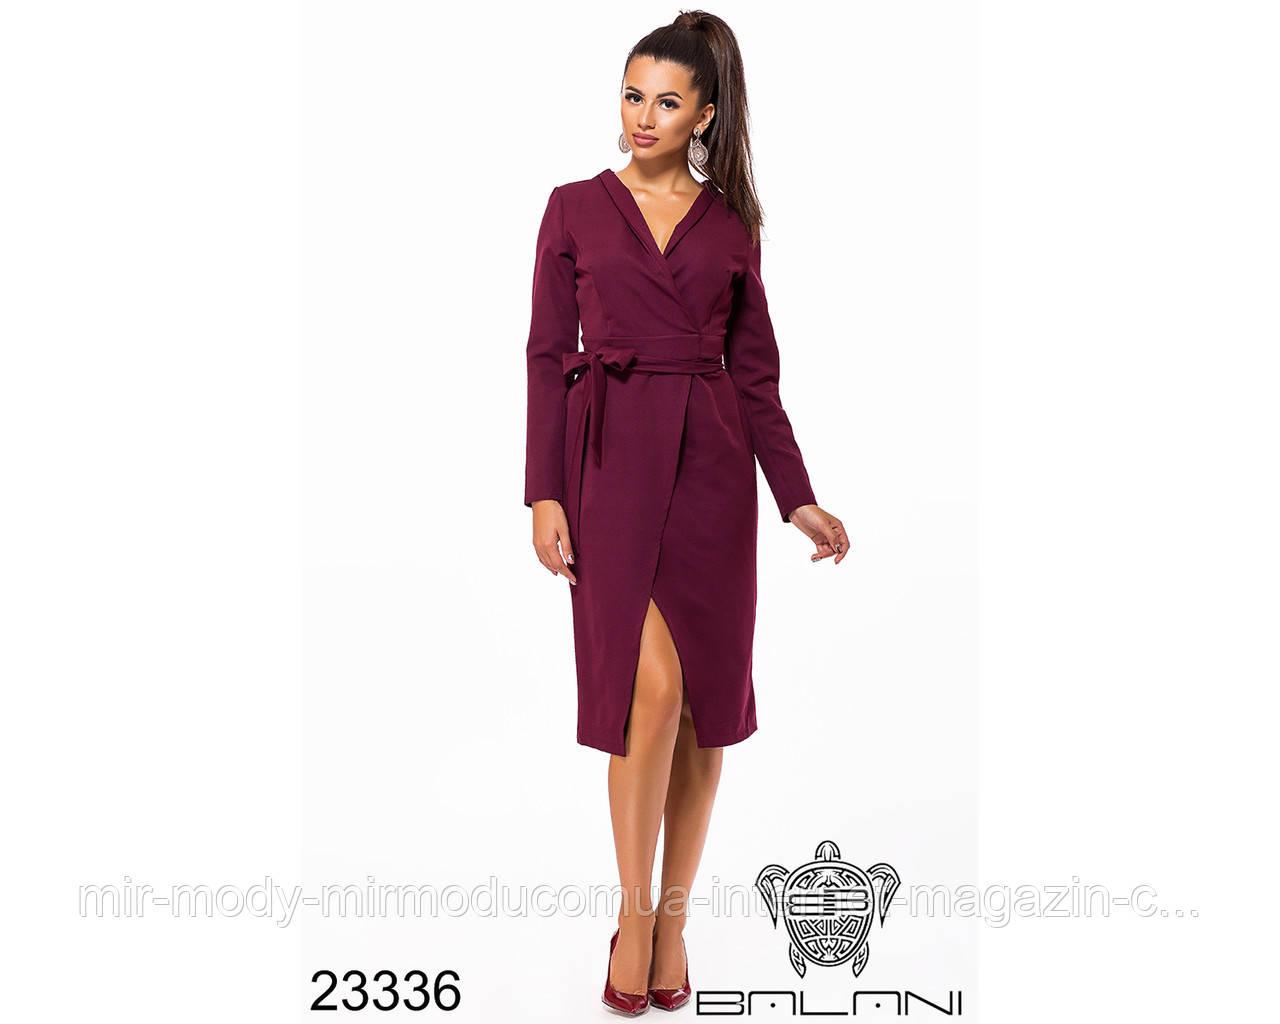 Платье на запах- 23336 с 42 по 46 размер (бн)